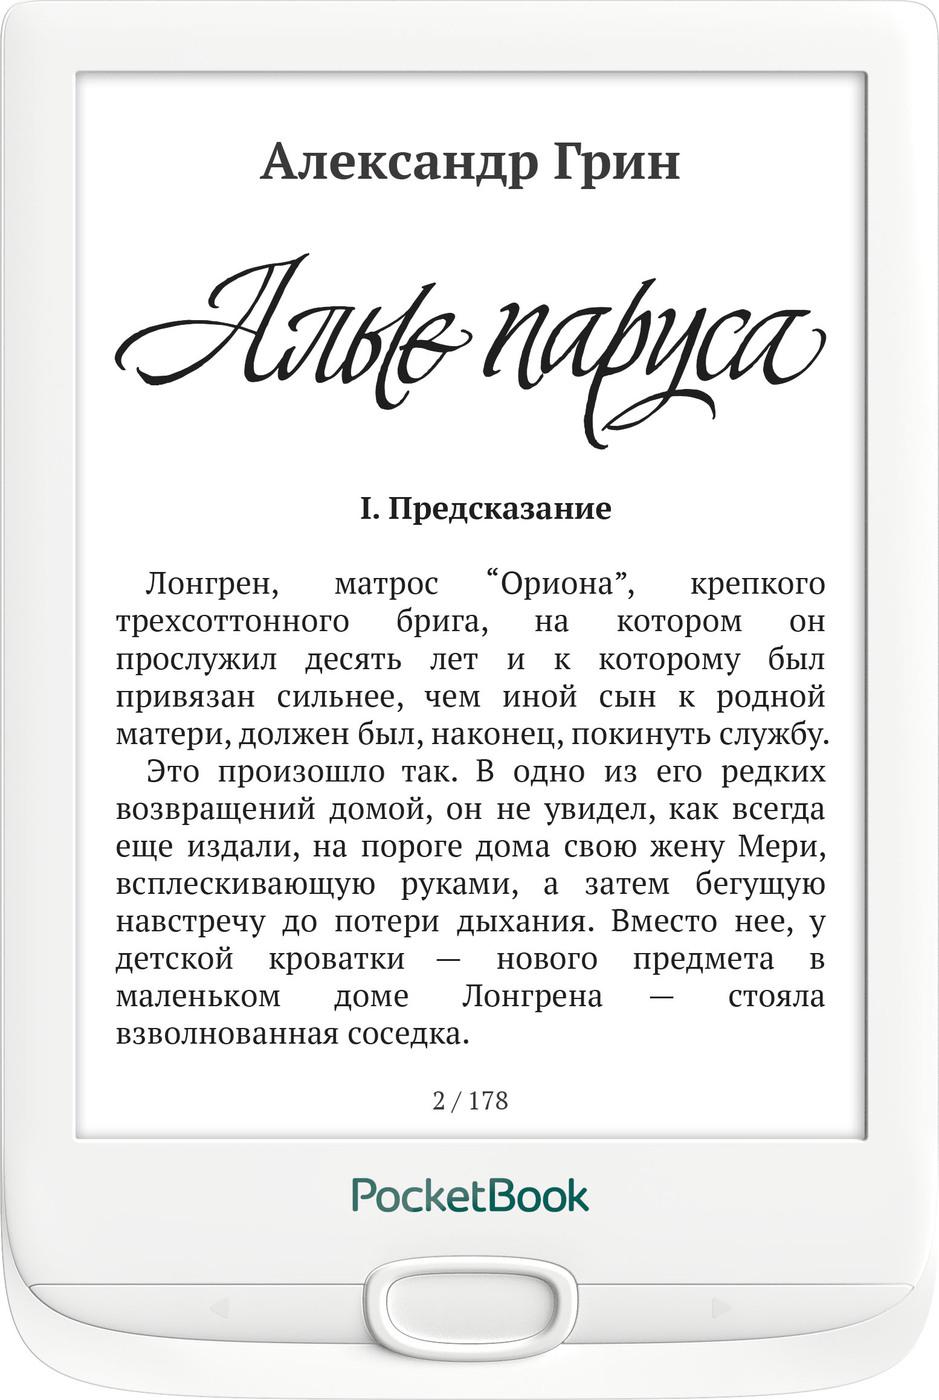 электронная книга pocketbook 606, белый